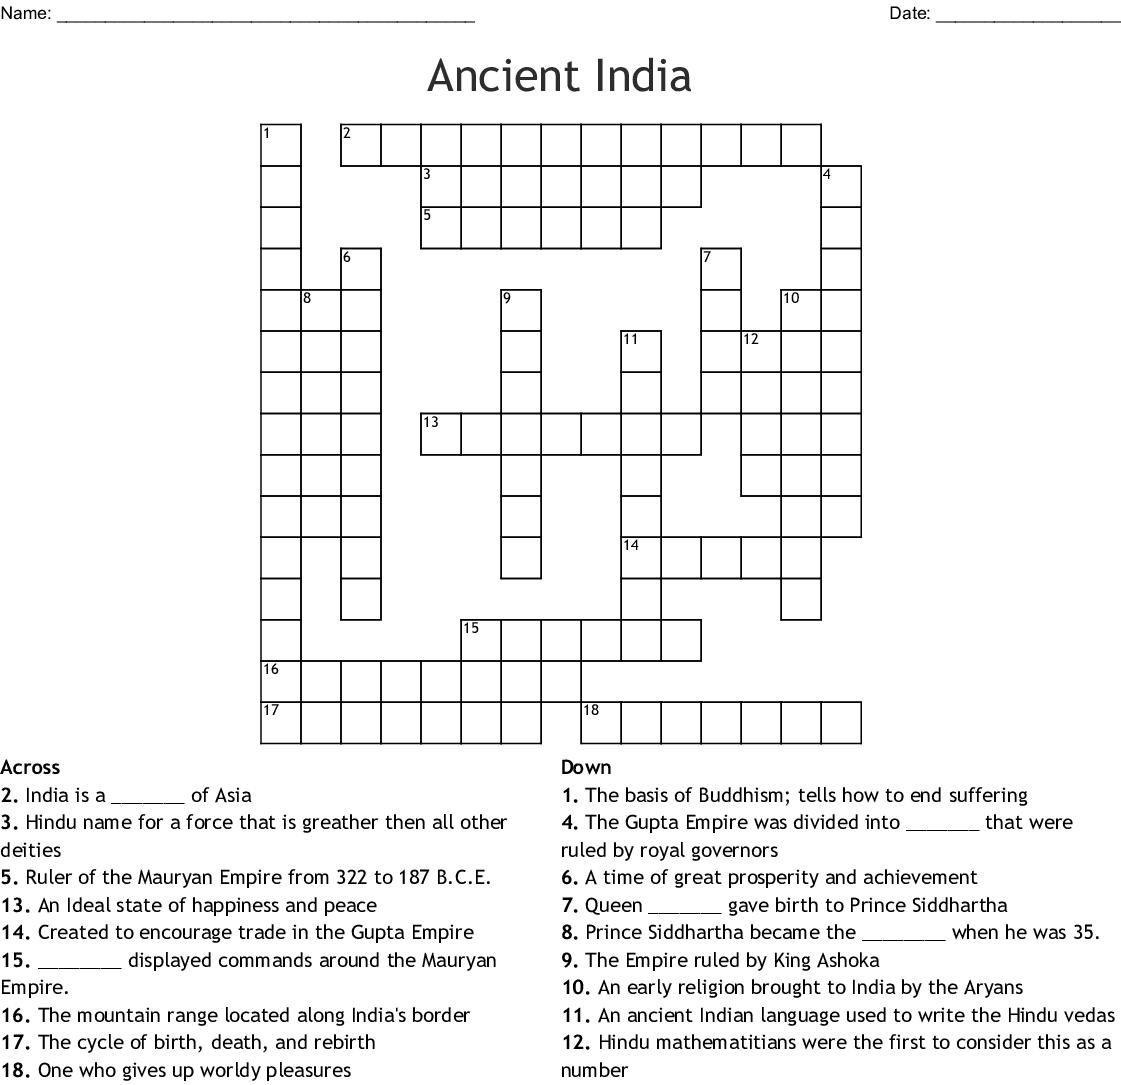 Ancient India Crossword